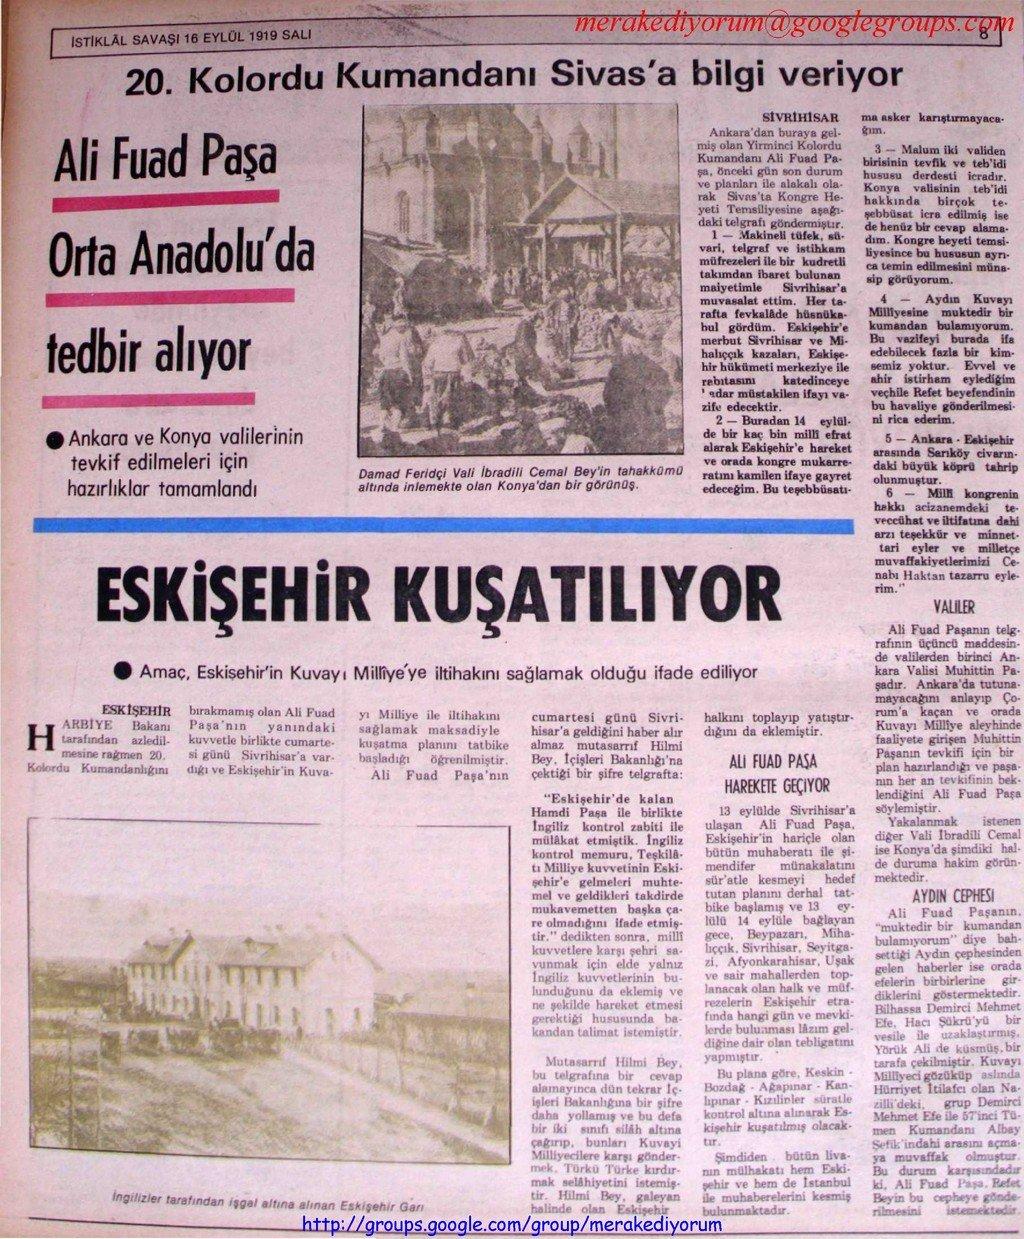 istiklal savaşı gazetesi - 16 eylül 1919